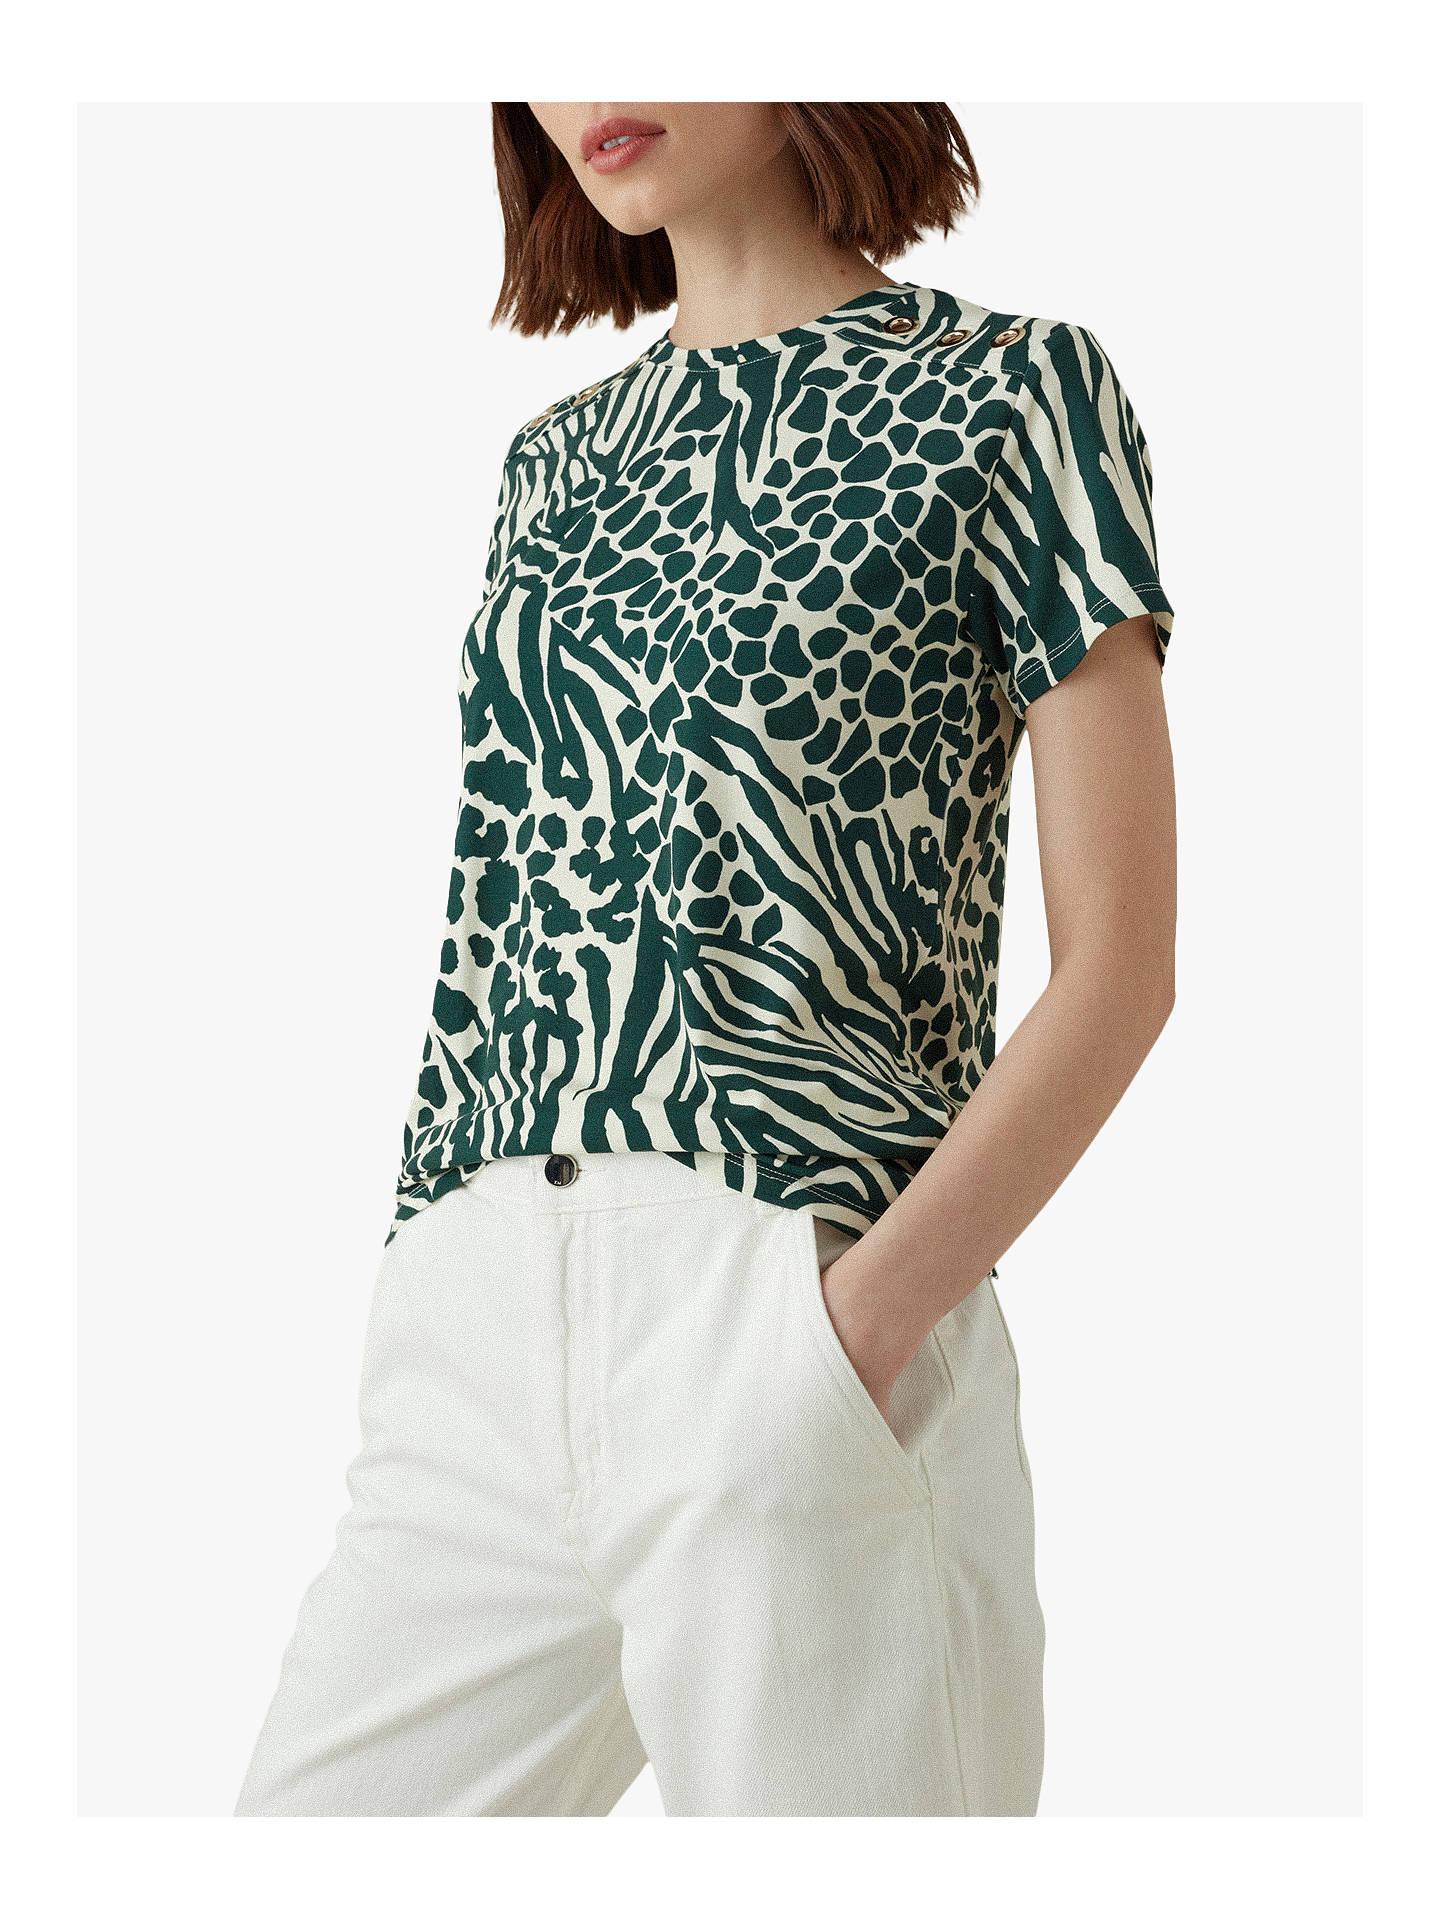 a0192686636 Karen Millen Animal Print T-Shirt, Green/Multi at John Lewis & Partners